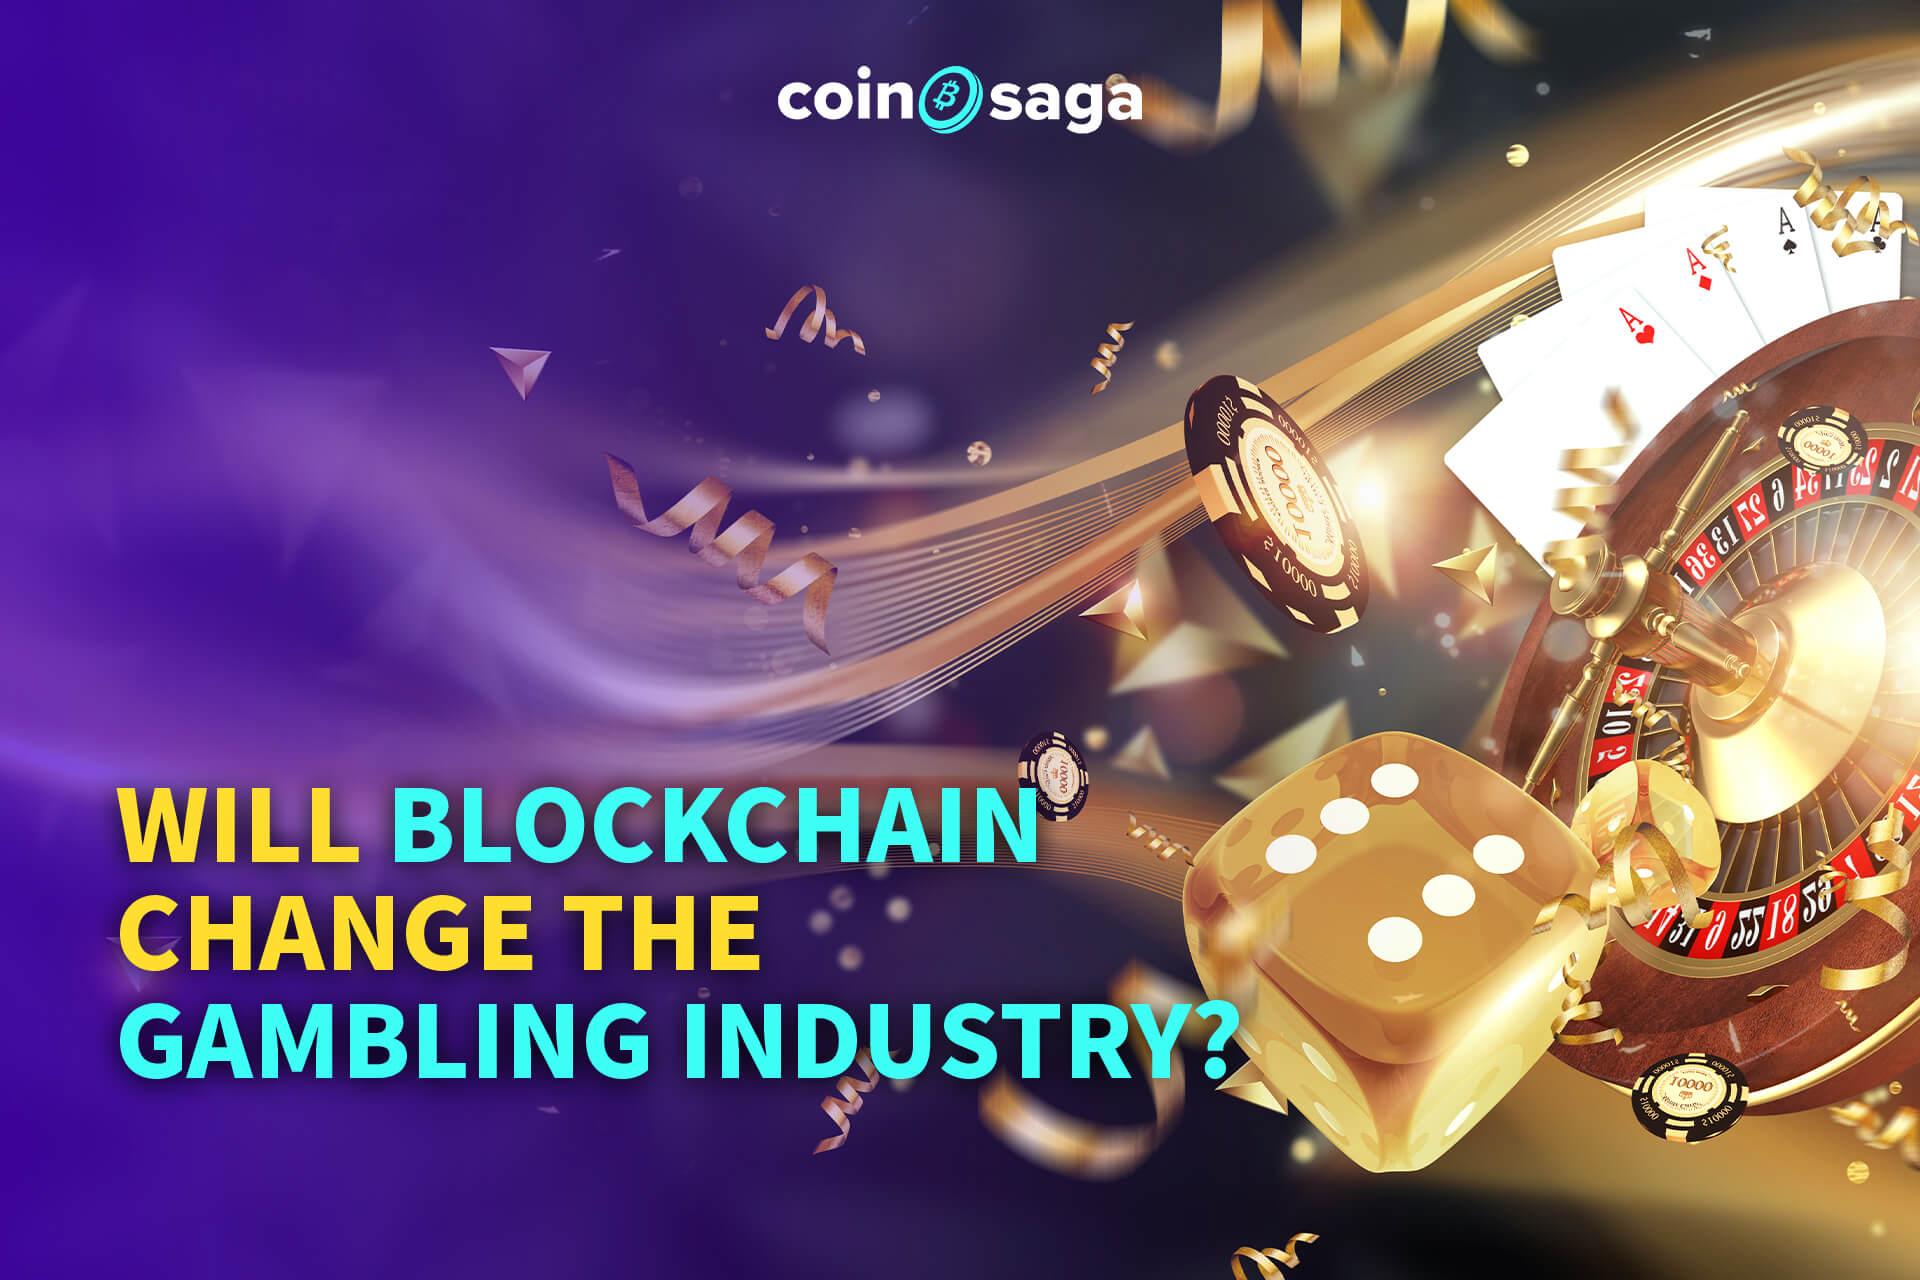 blockchain changes gambling industry